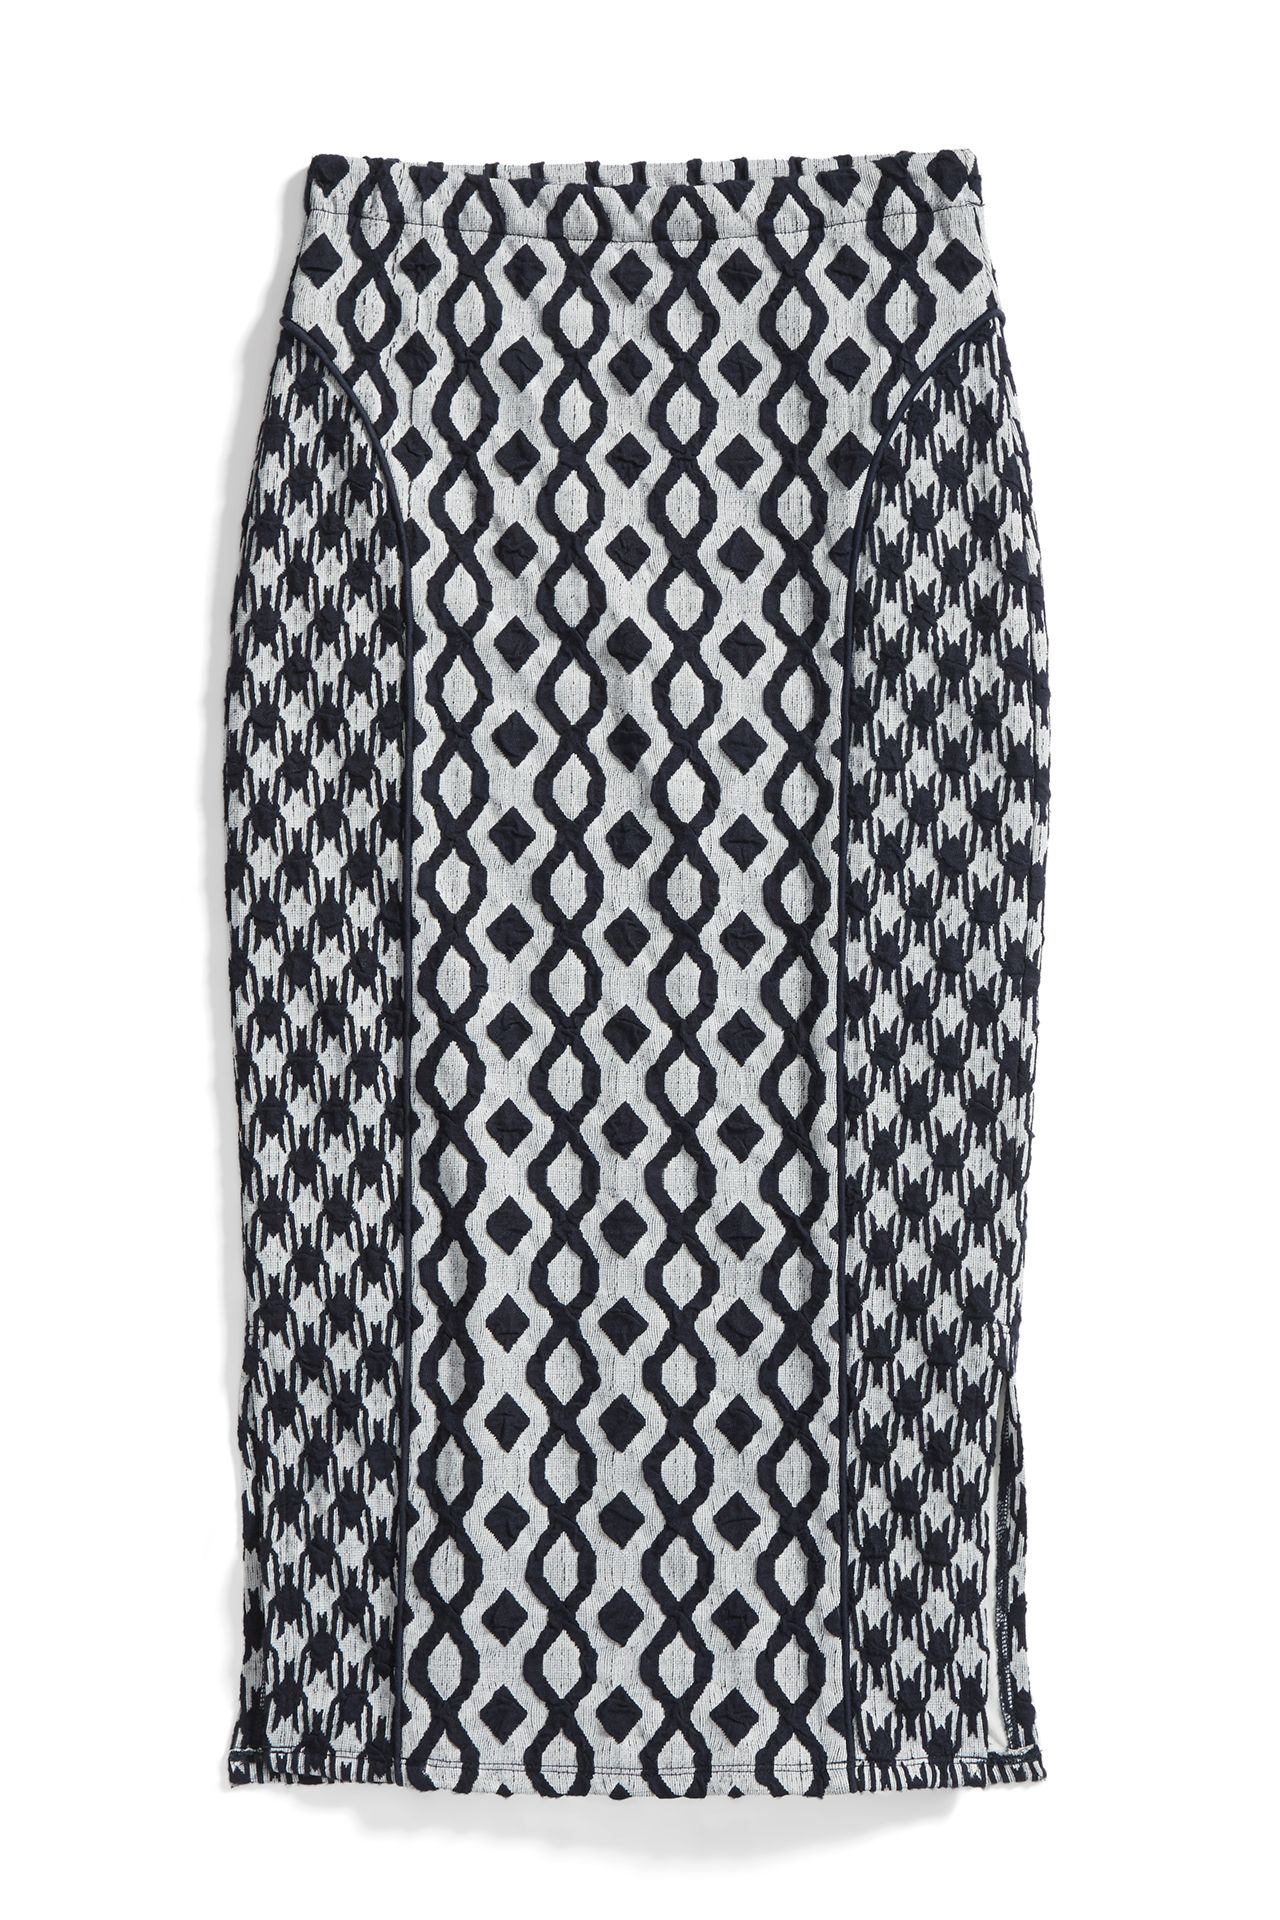 Love this skirt moda para mujer madura pinterest for Maduras en la oficina